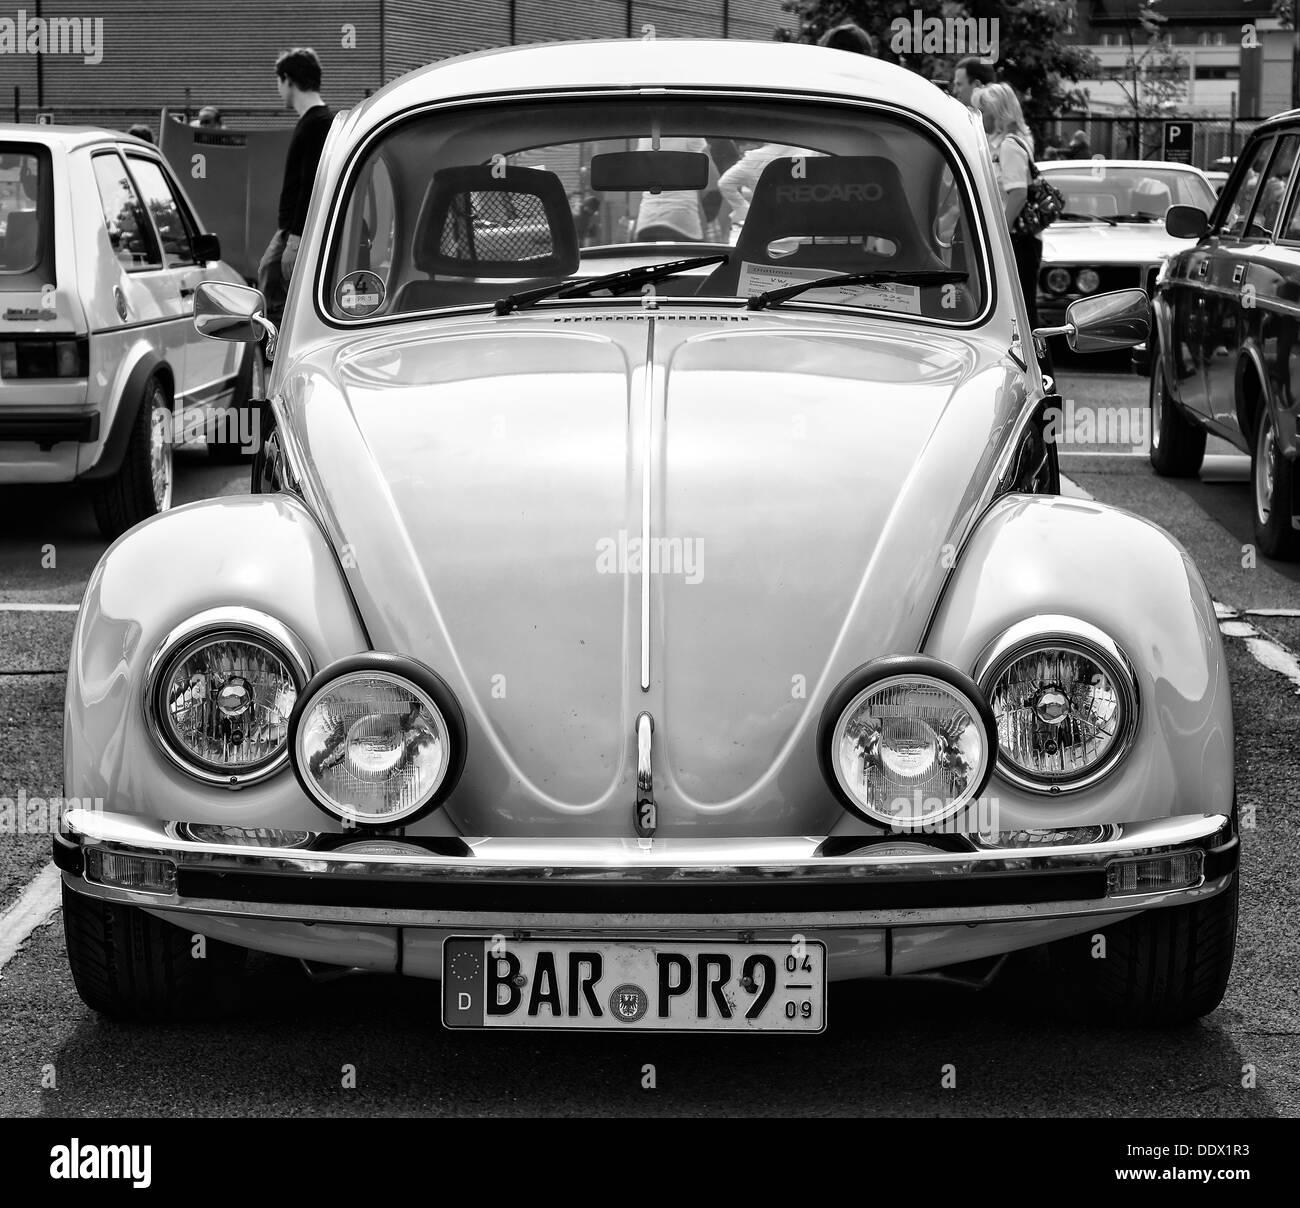 berlin may 11 car volkswagen beetle black and white. Black Bedroom Furniture Sets. Home Design Ideas